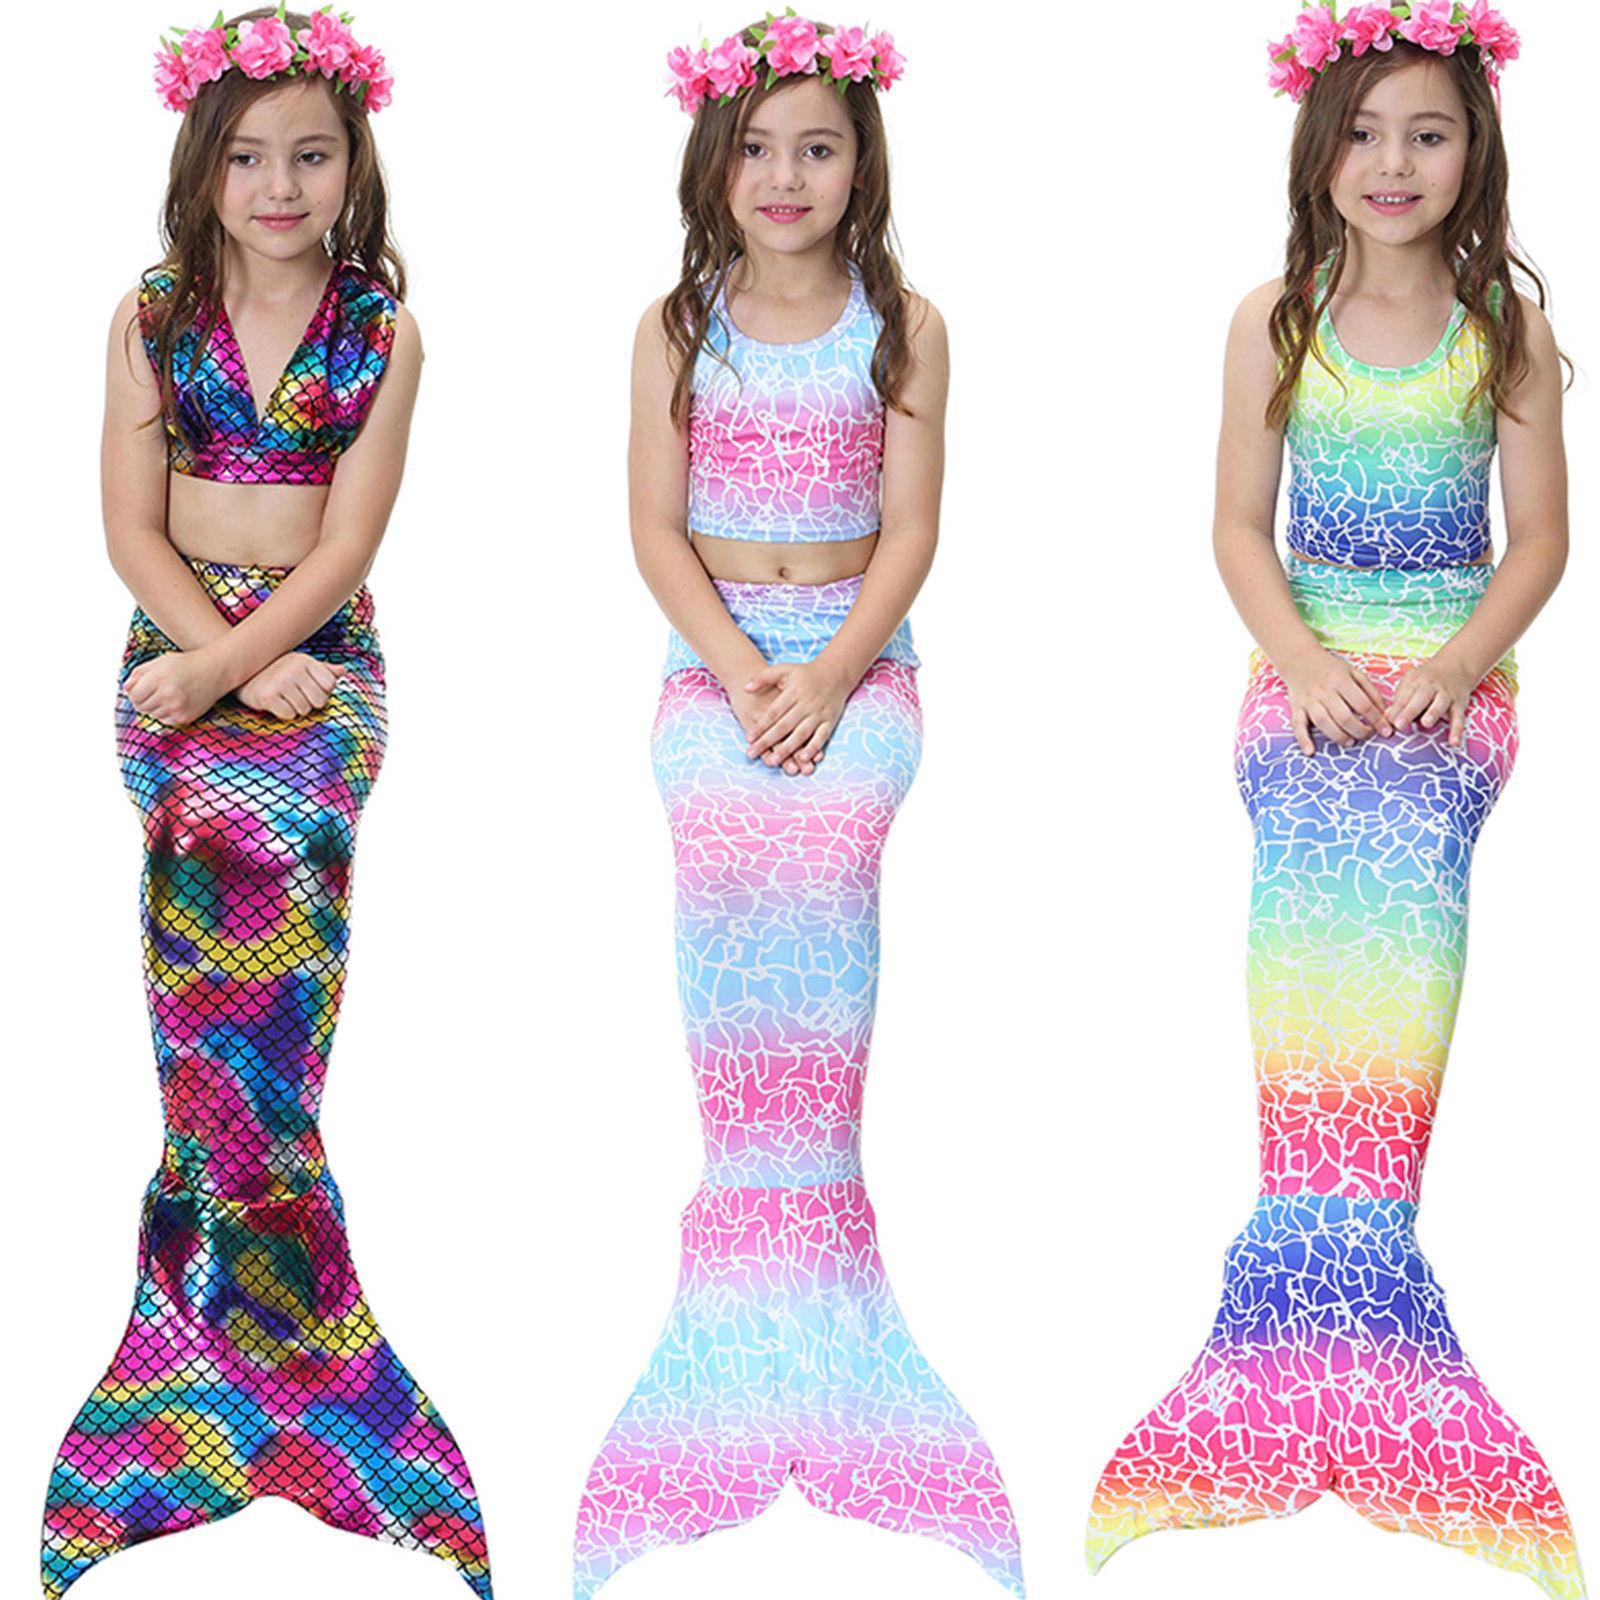 5e514b8f98 2019 Swimwear Kids Clothing Kids Girls Mermaid Tail Swimming Bikini Set  Swimwear Mono Fin Swimmable From Happy_kids, $14.58 | DHgate.Com